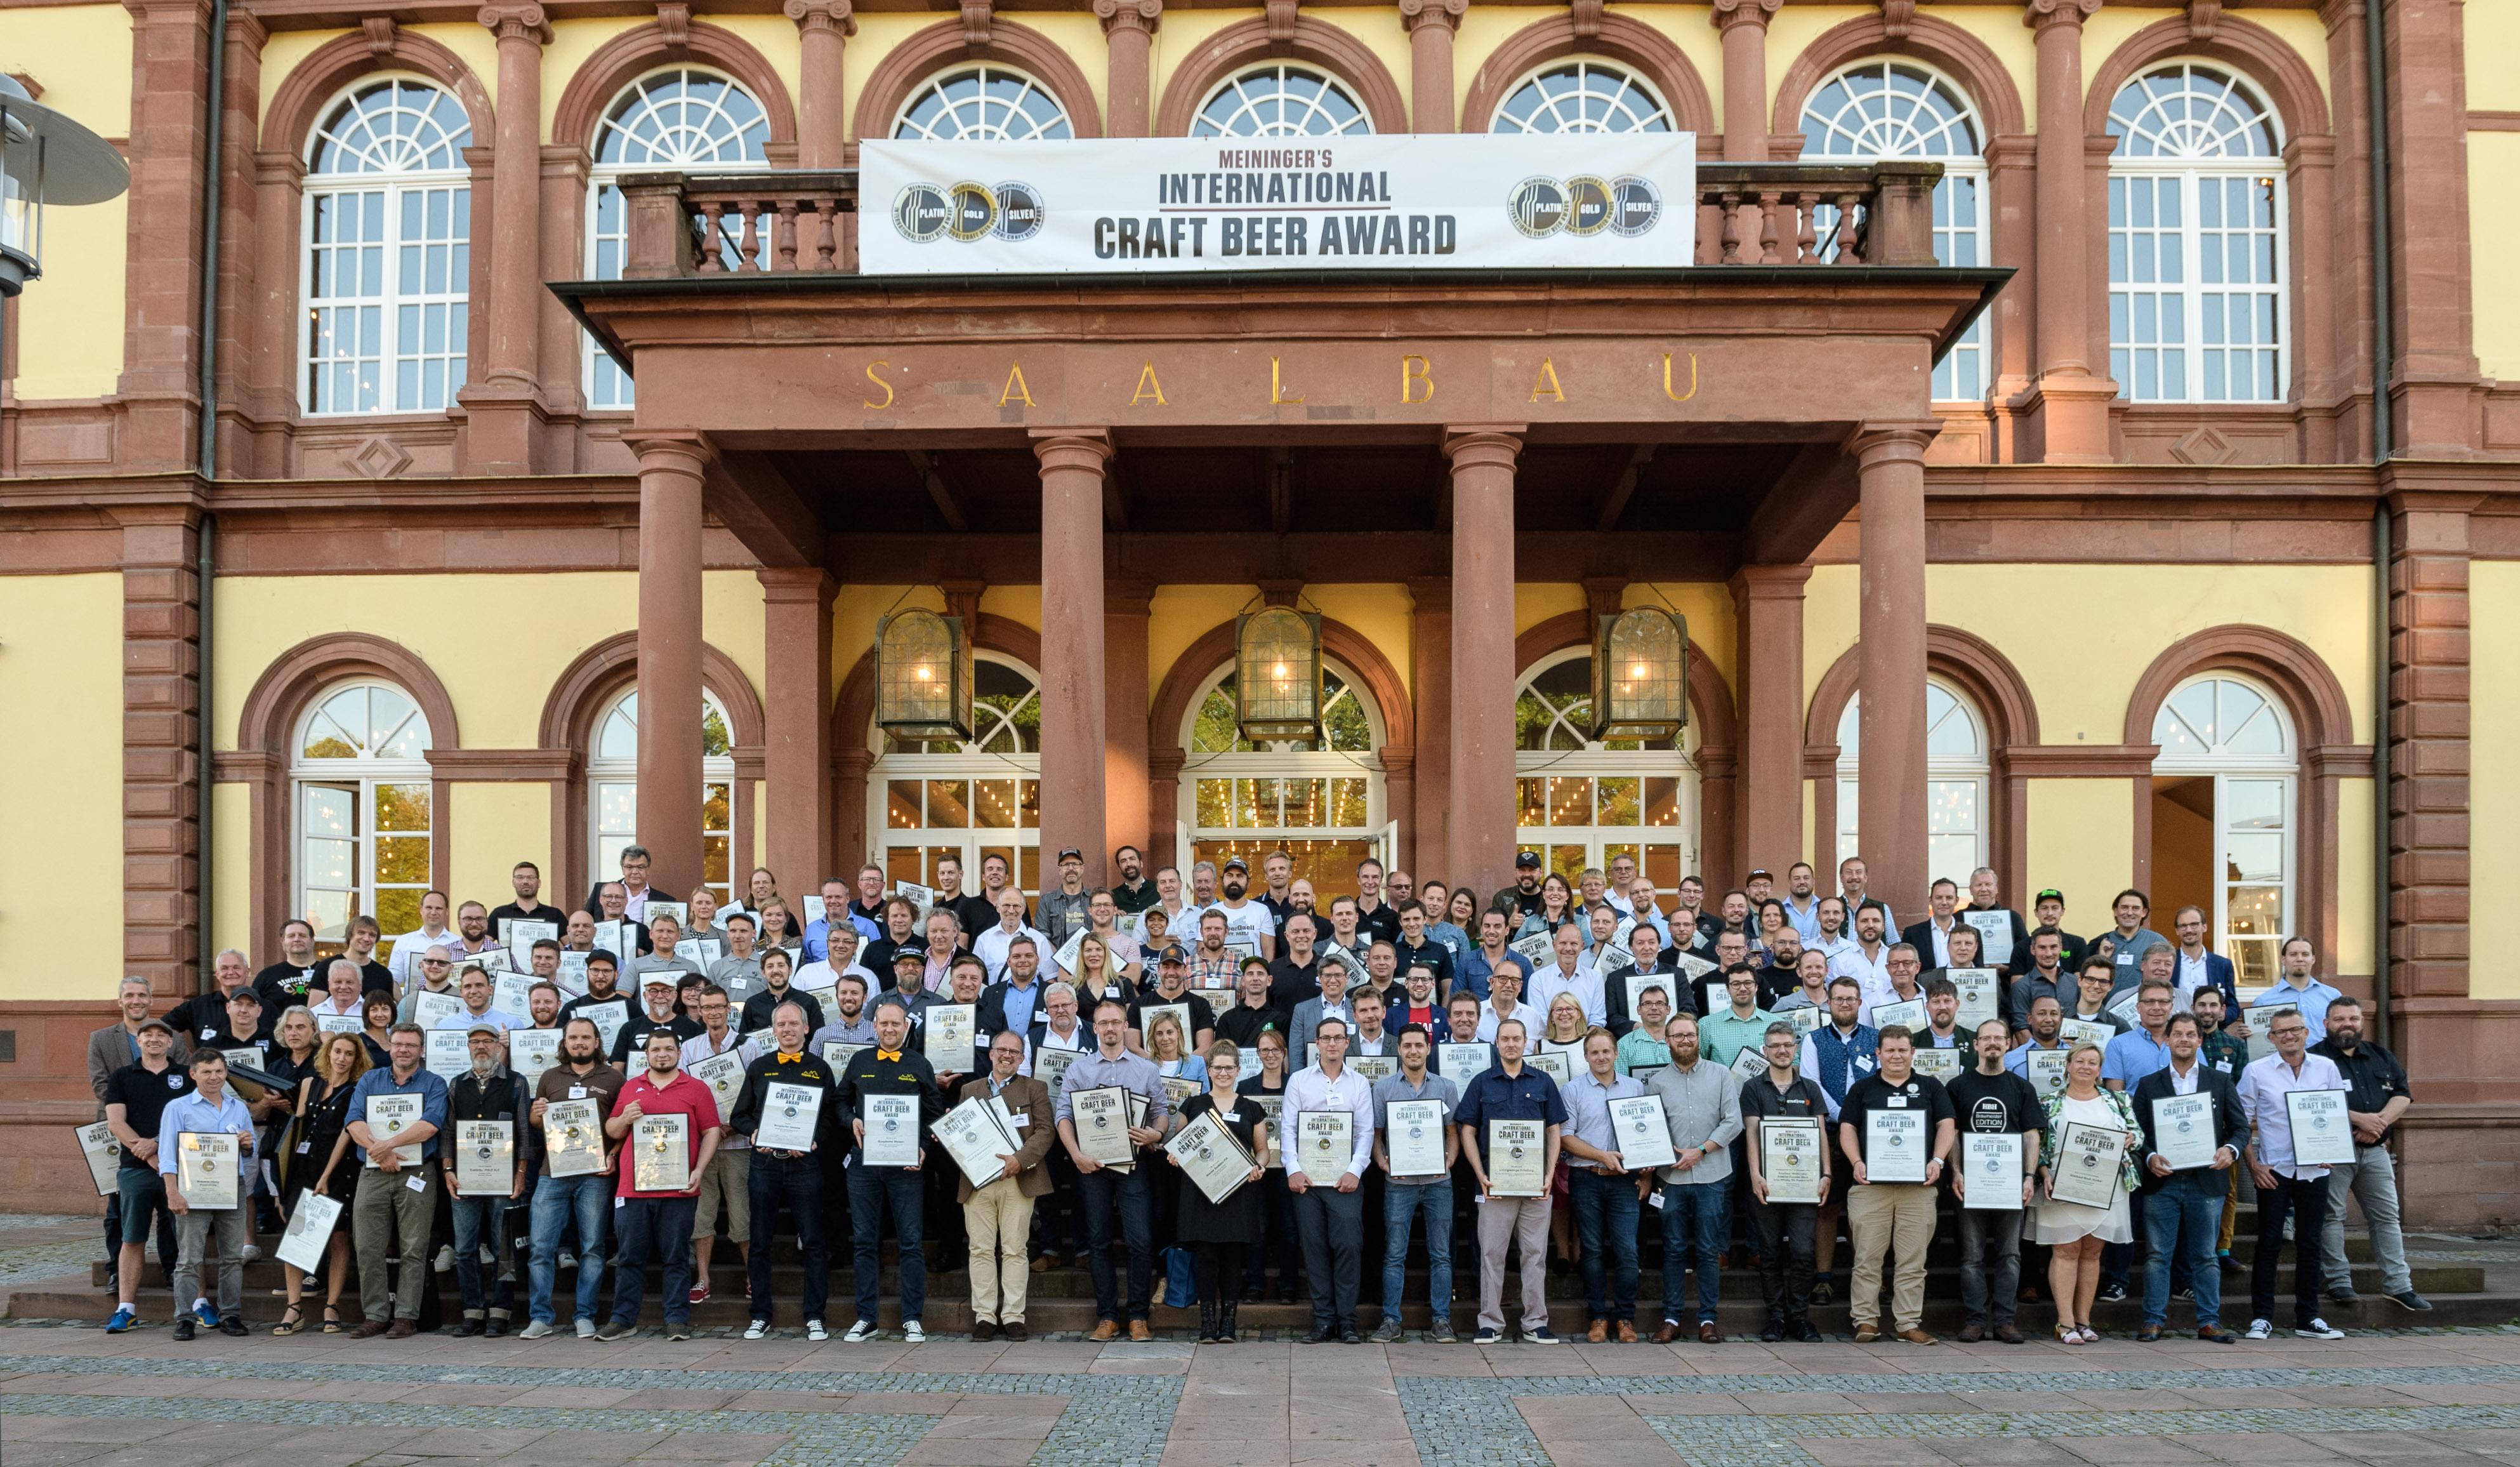 Meininger Craftbeer Award Gruppenfoto